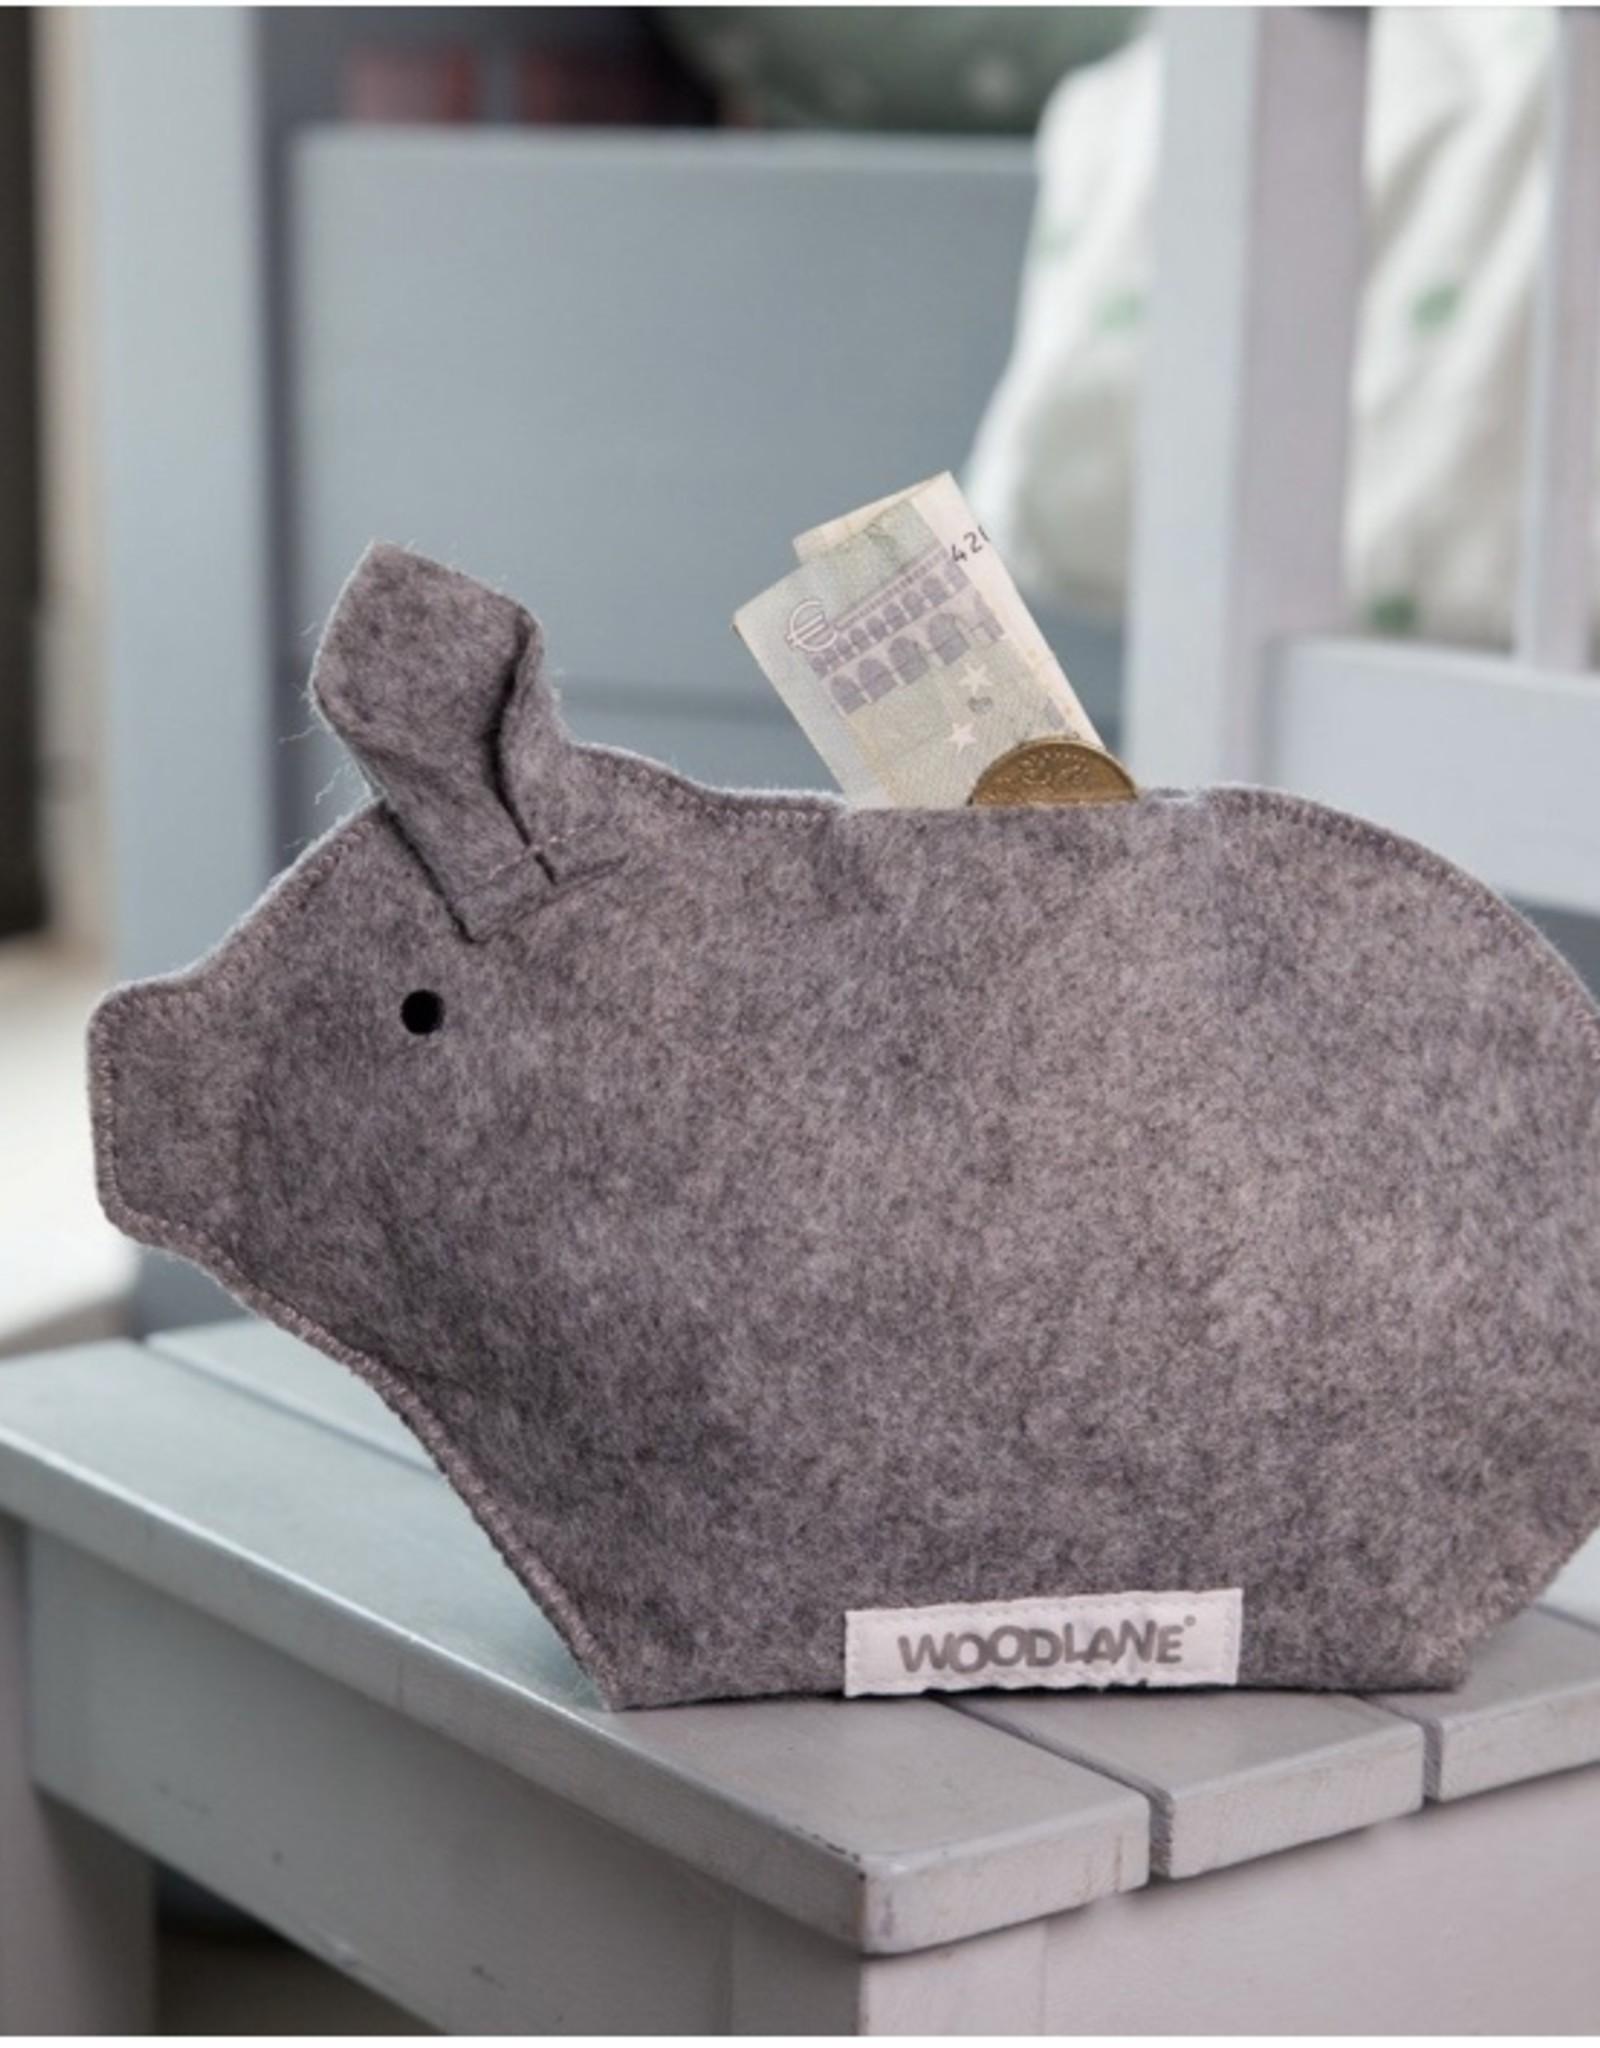 Woodlane Recycled piggy bank - Grey